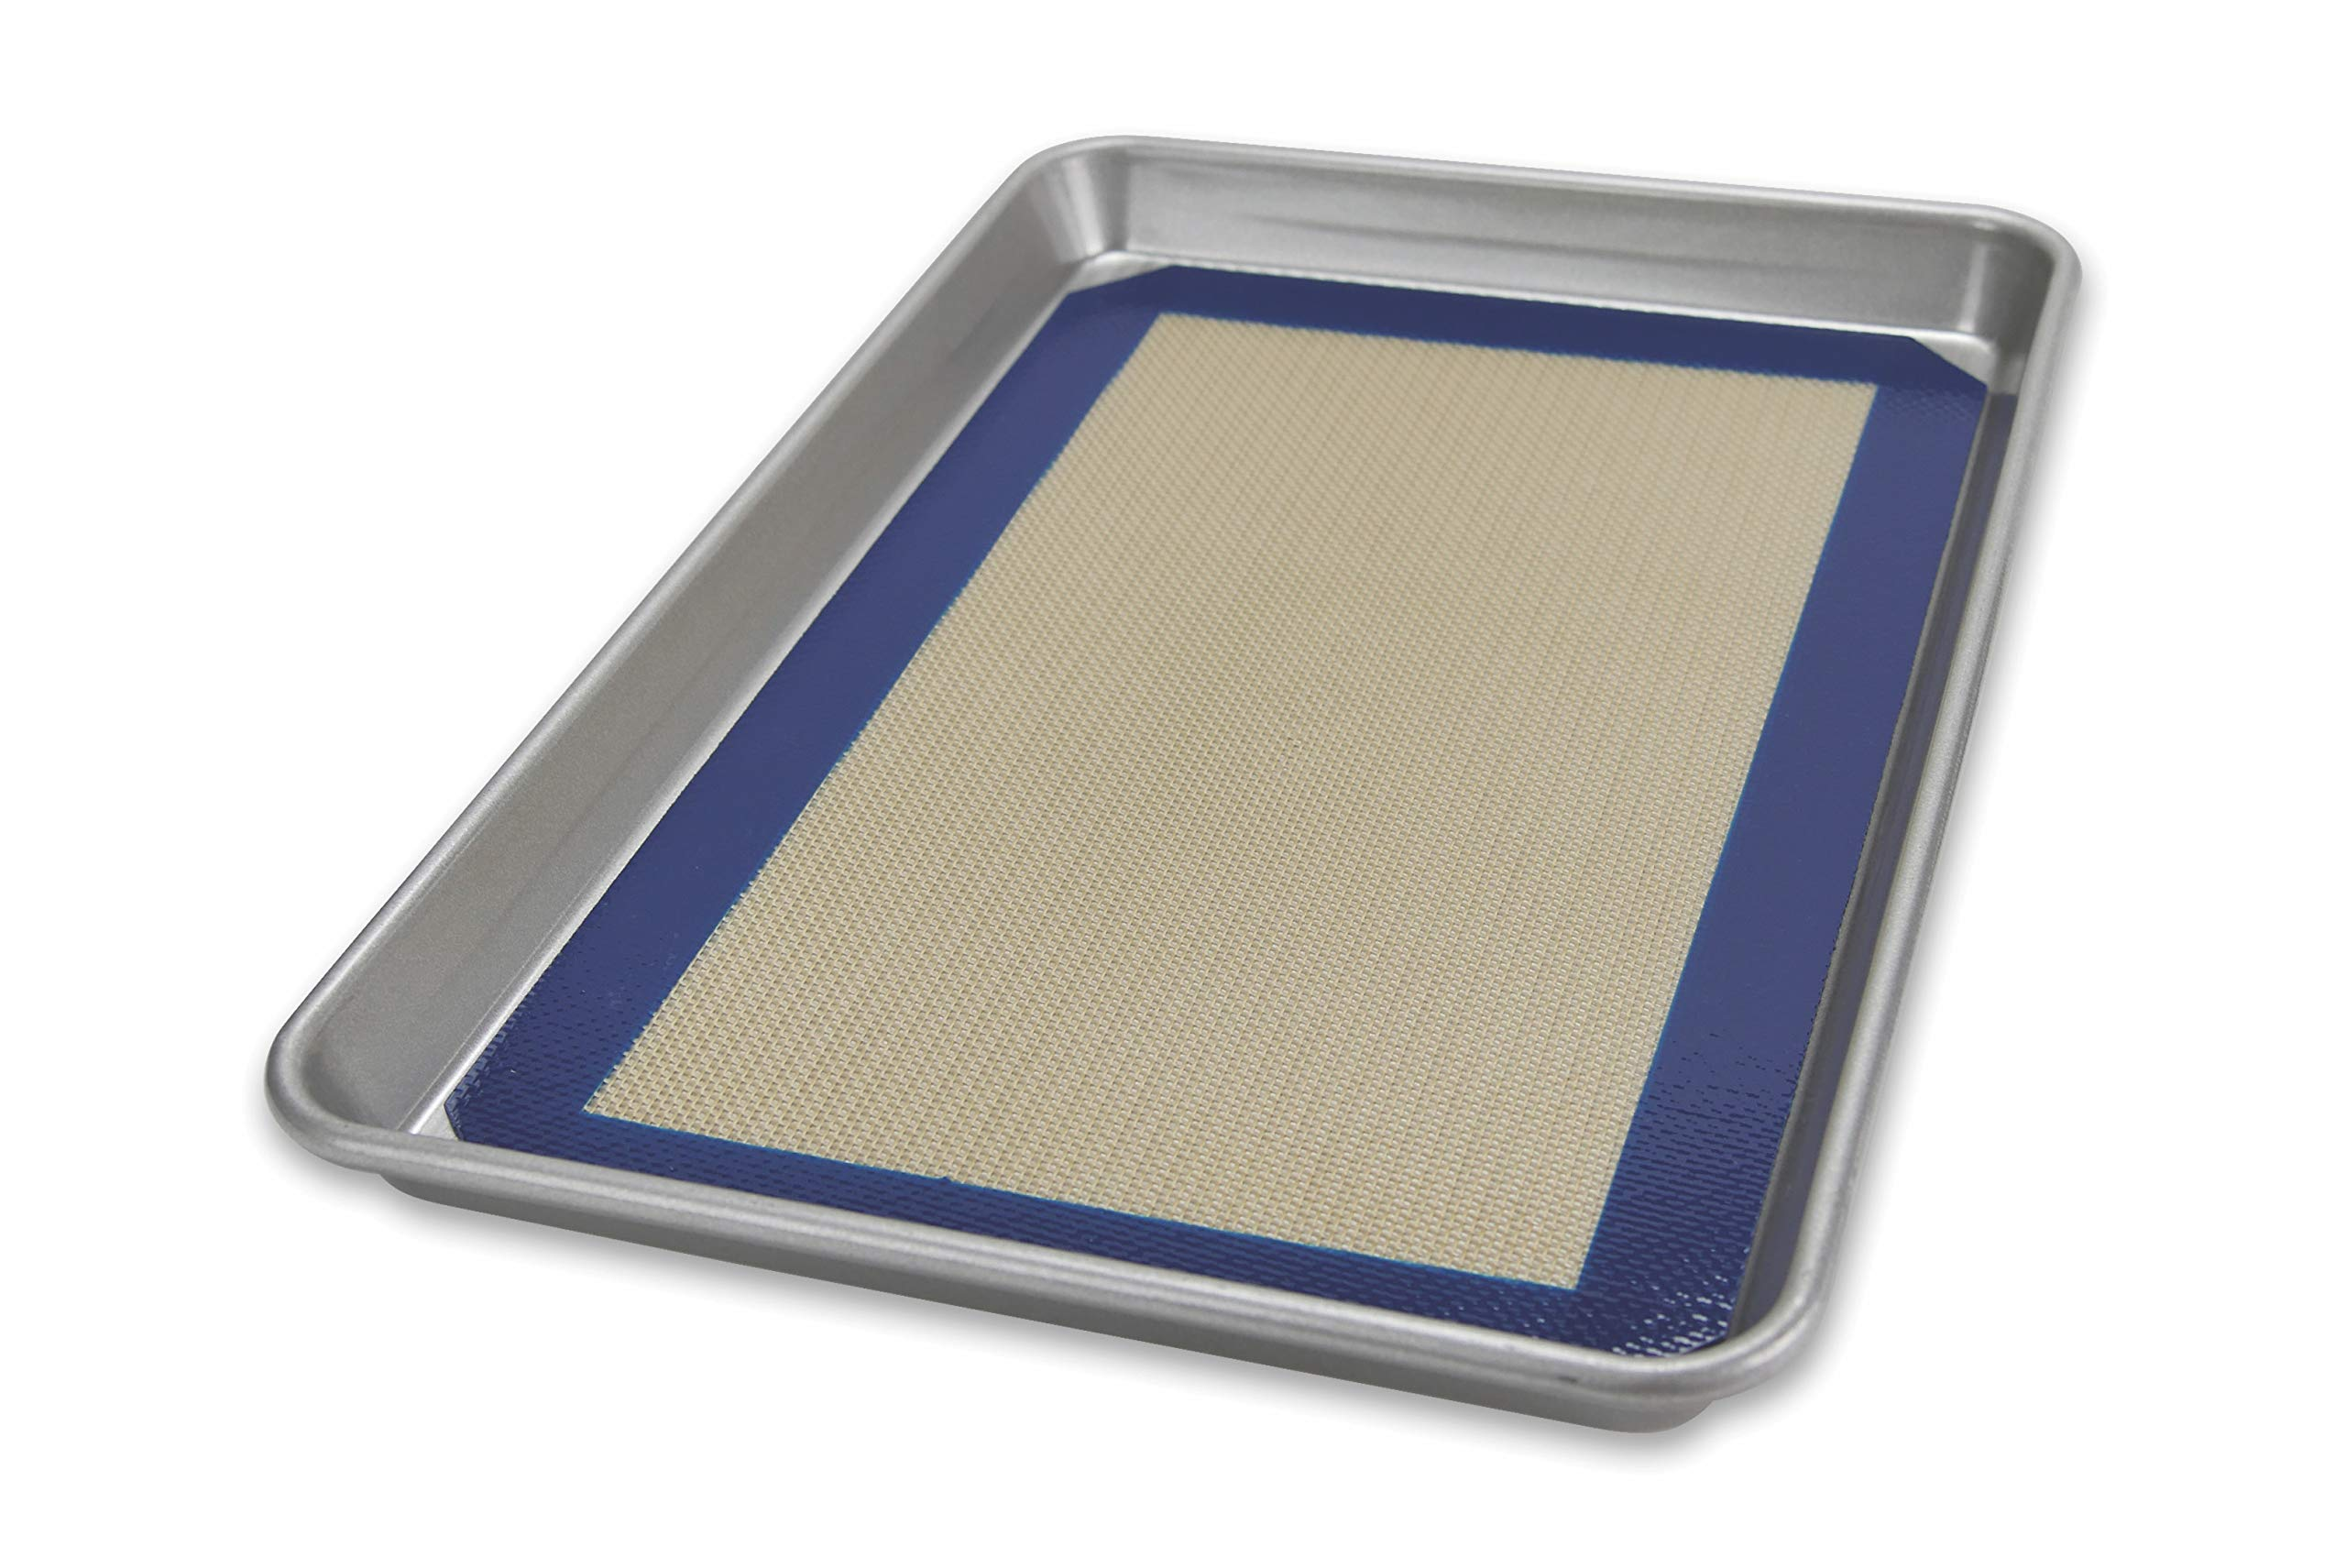 USA Pan 1704MT-1 Bakeware Nonstick Quarter Sheet Pan and Silicone Mat Set by USA Pan (Image #1)